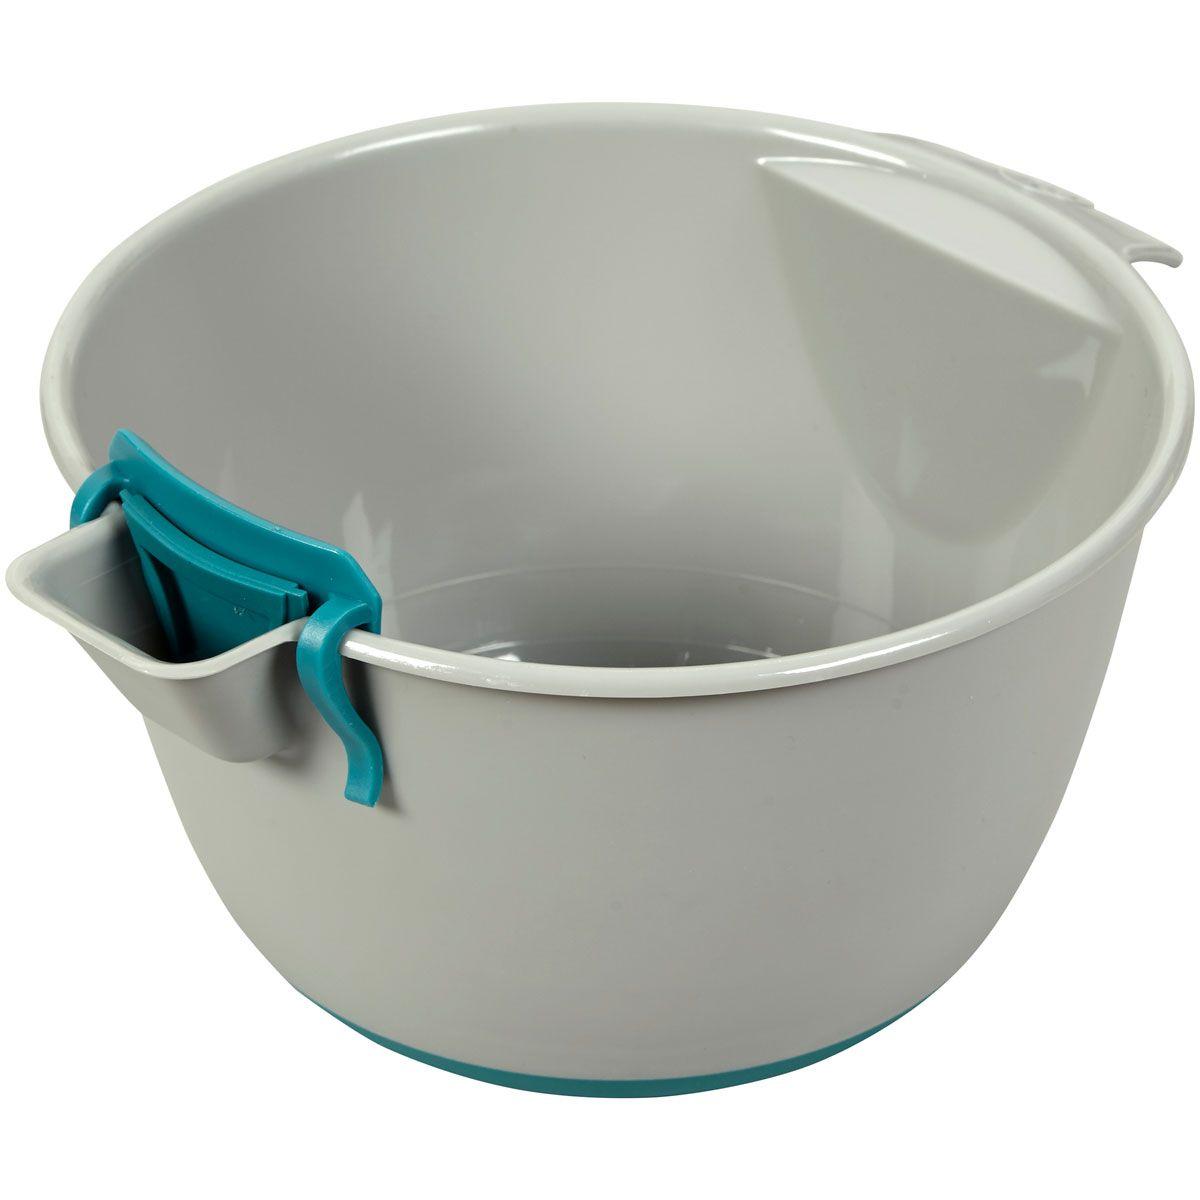 Taça Measure & Pour Bowl